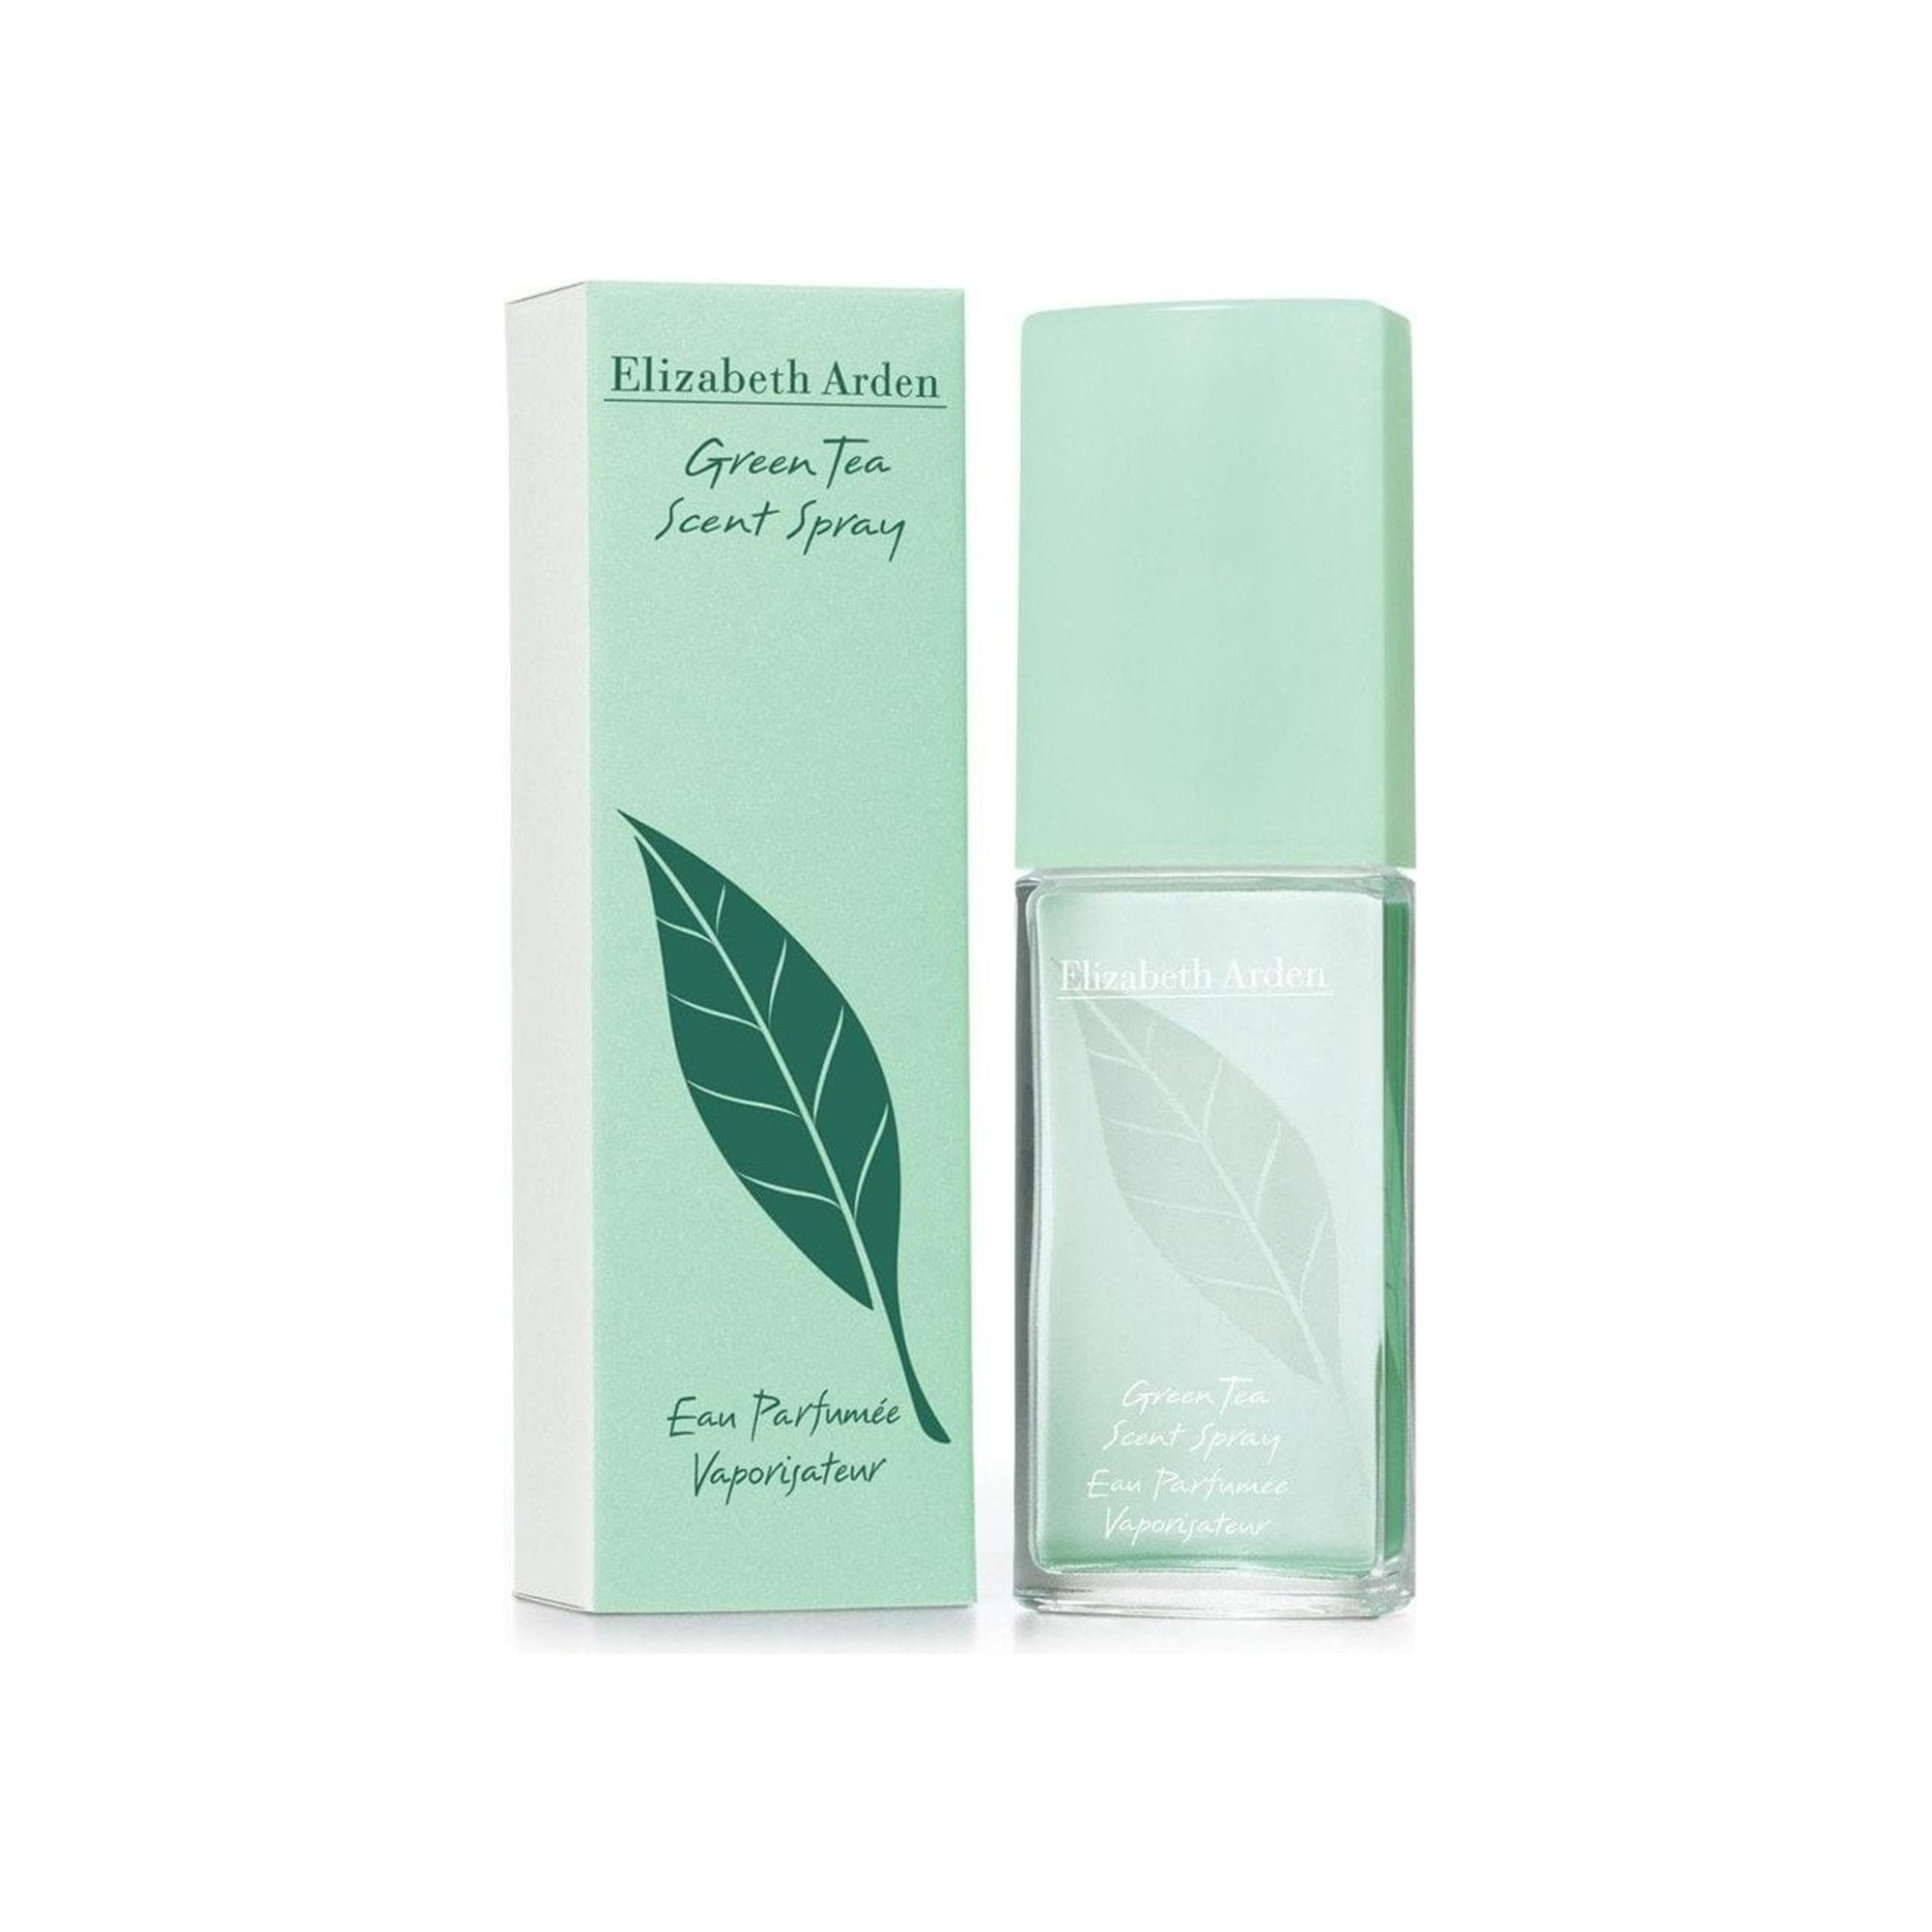 Image of Elizabeth Arden Green Tea 50ml EDP